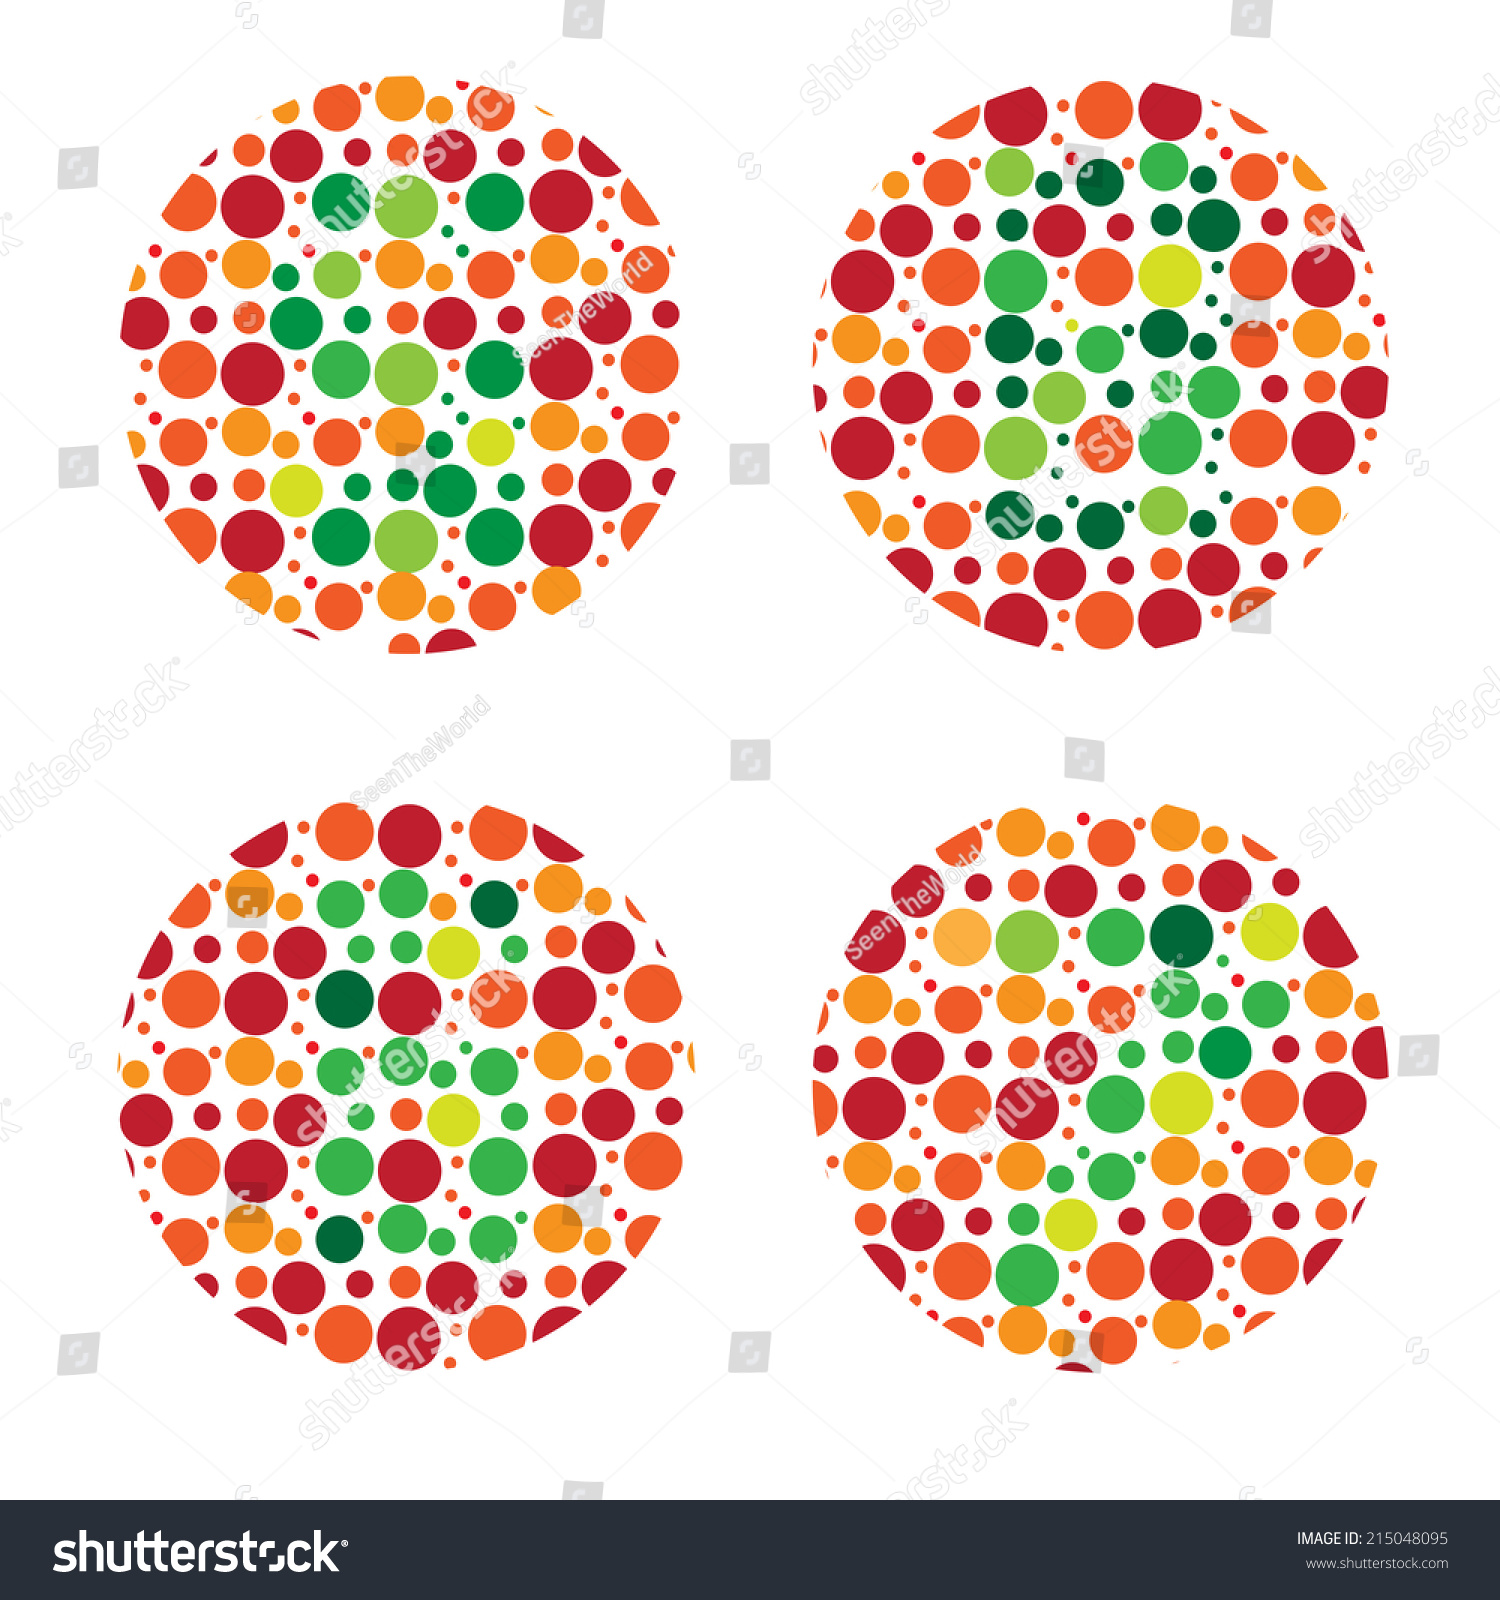 Co color vision tests online - Online Color Blind Test Color Blind Art Color Blind Test Daltonism Color Blindness Disease Perception